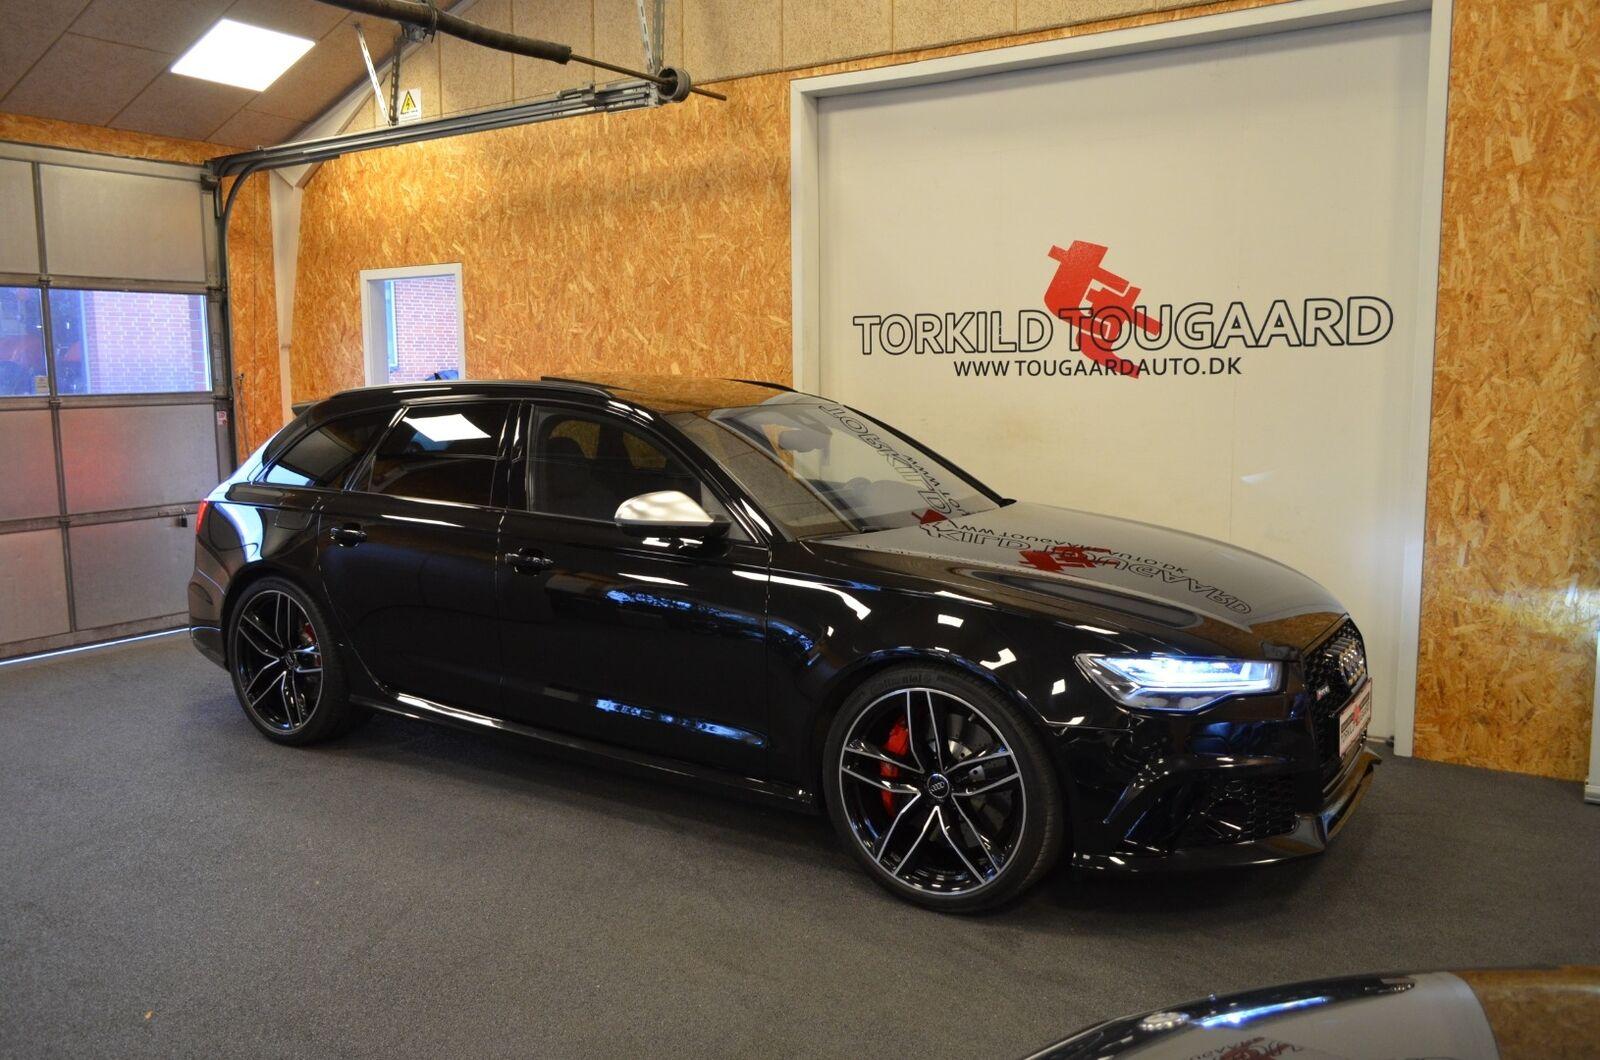 Audi RS6 4,0 TFSi Avant quattro Tiptr. 5d - 1.349.800 kr.